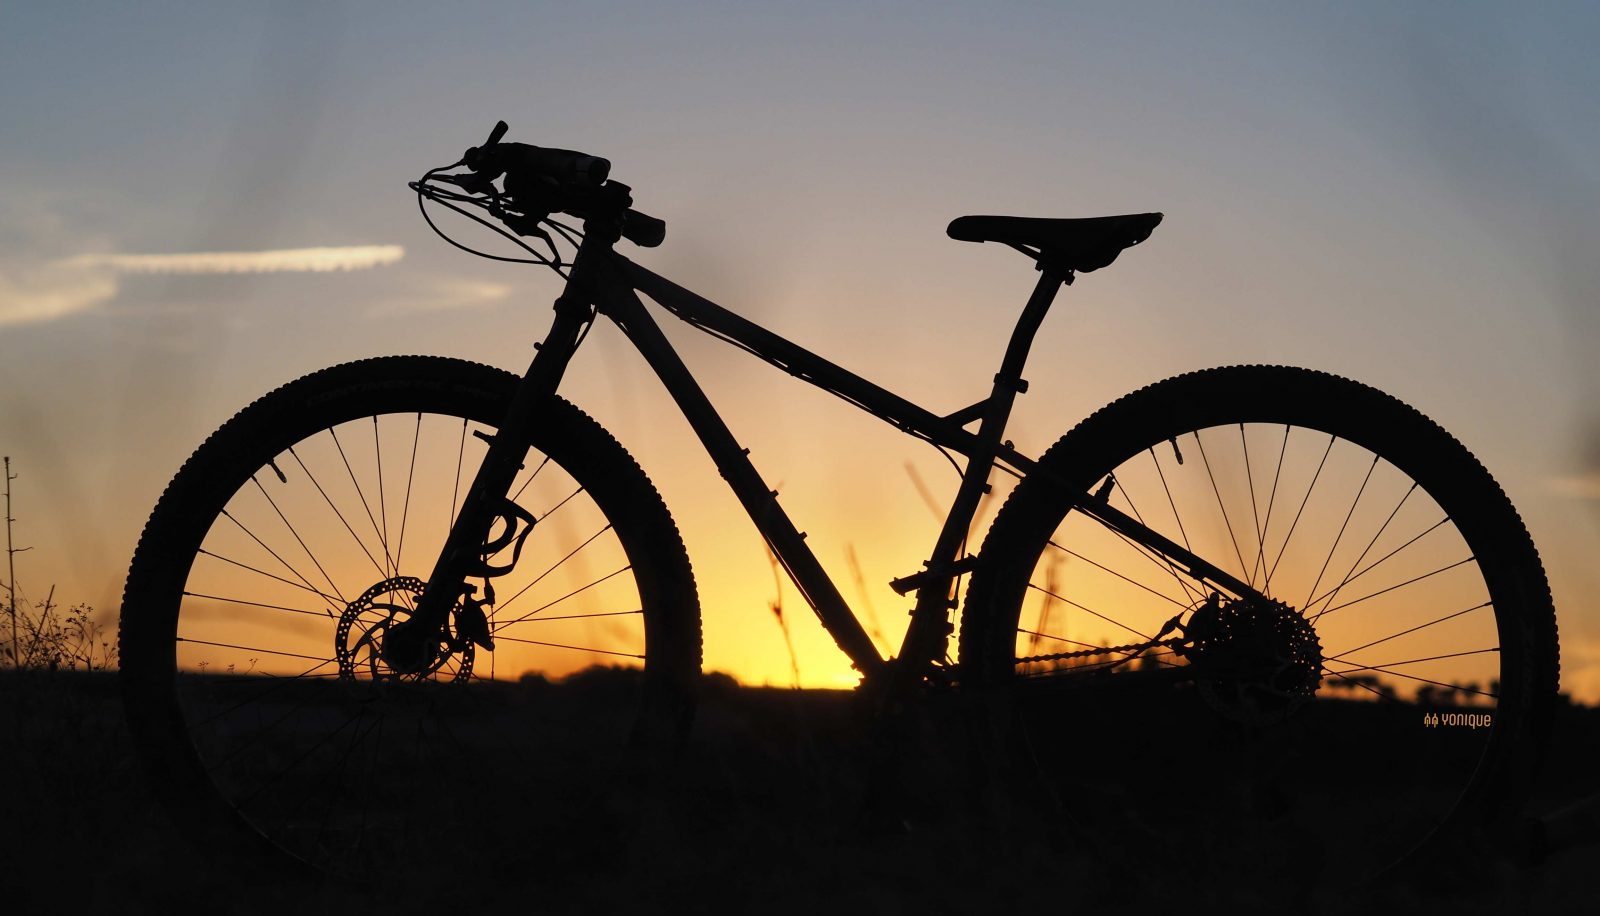 ogre-surlybikes-yoniquenews-sunset-spain